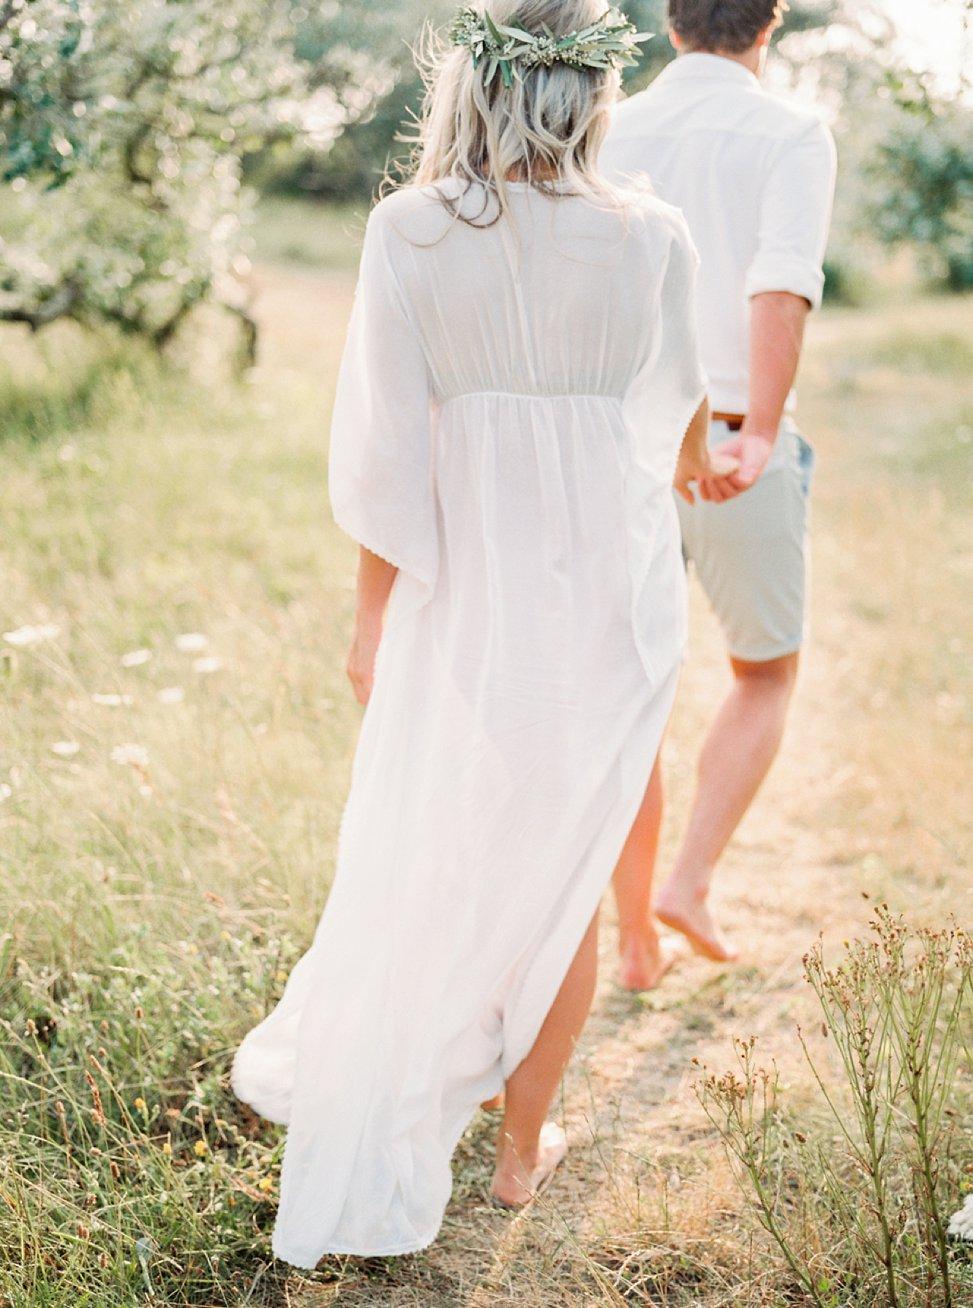 Amanda-Drost-Fotografie-fine-art-liefde-trouwen-italie_0008.jpg